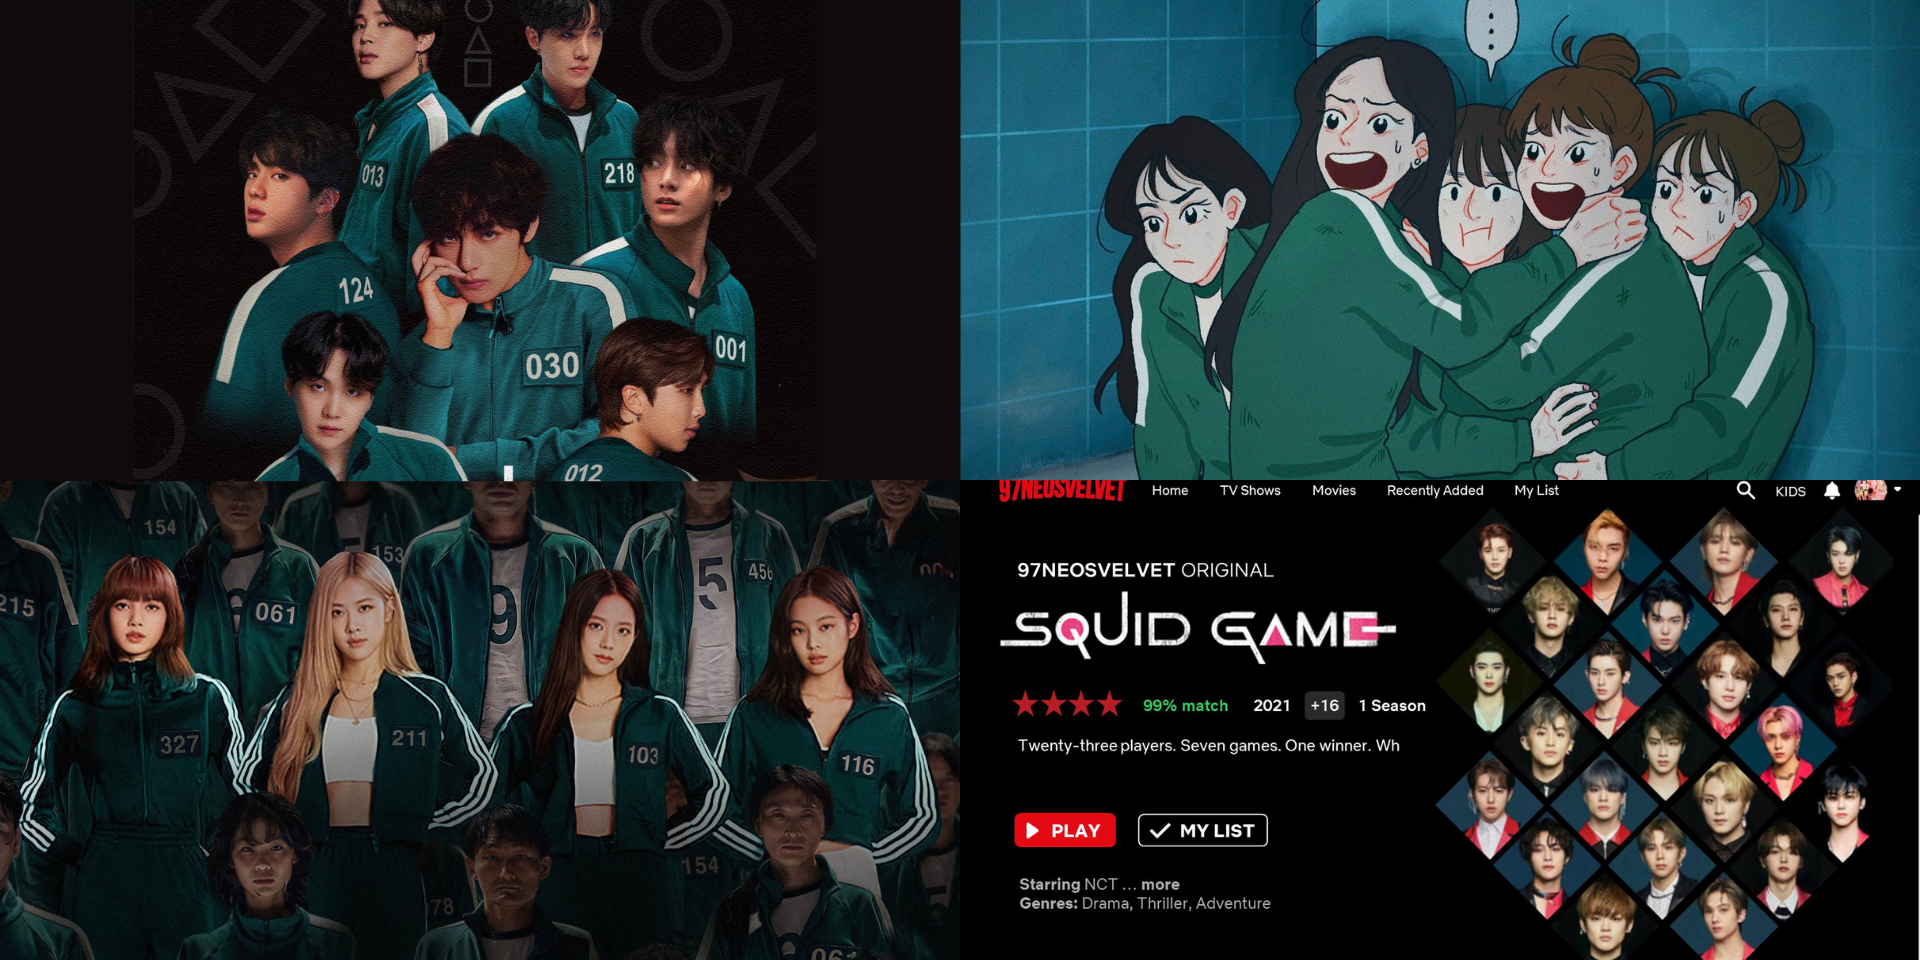 K-pop fans reimagine their favourite idols in Squid Game – BTS, Red Velvet, NCT, BLACKPINK, and more